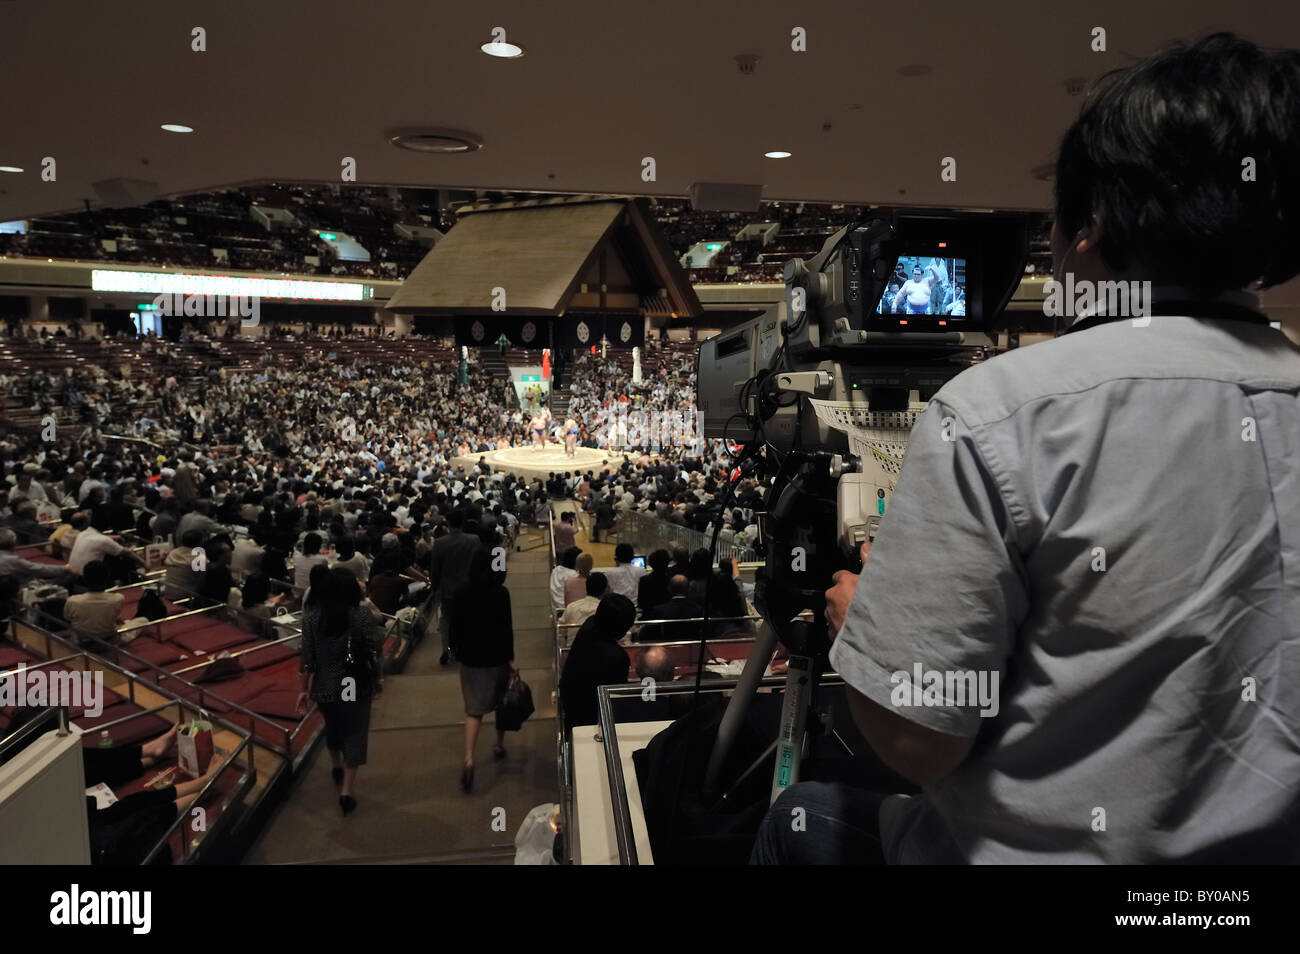 Cameraman making a close-up of the ring, Grand Sumo Tournament May 2010, Ryogoku Kokugikan, Tokyo, Japan Stock Photo